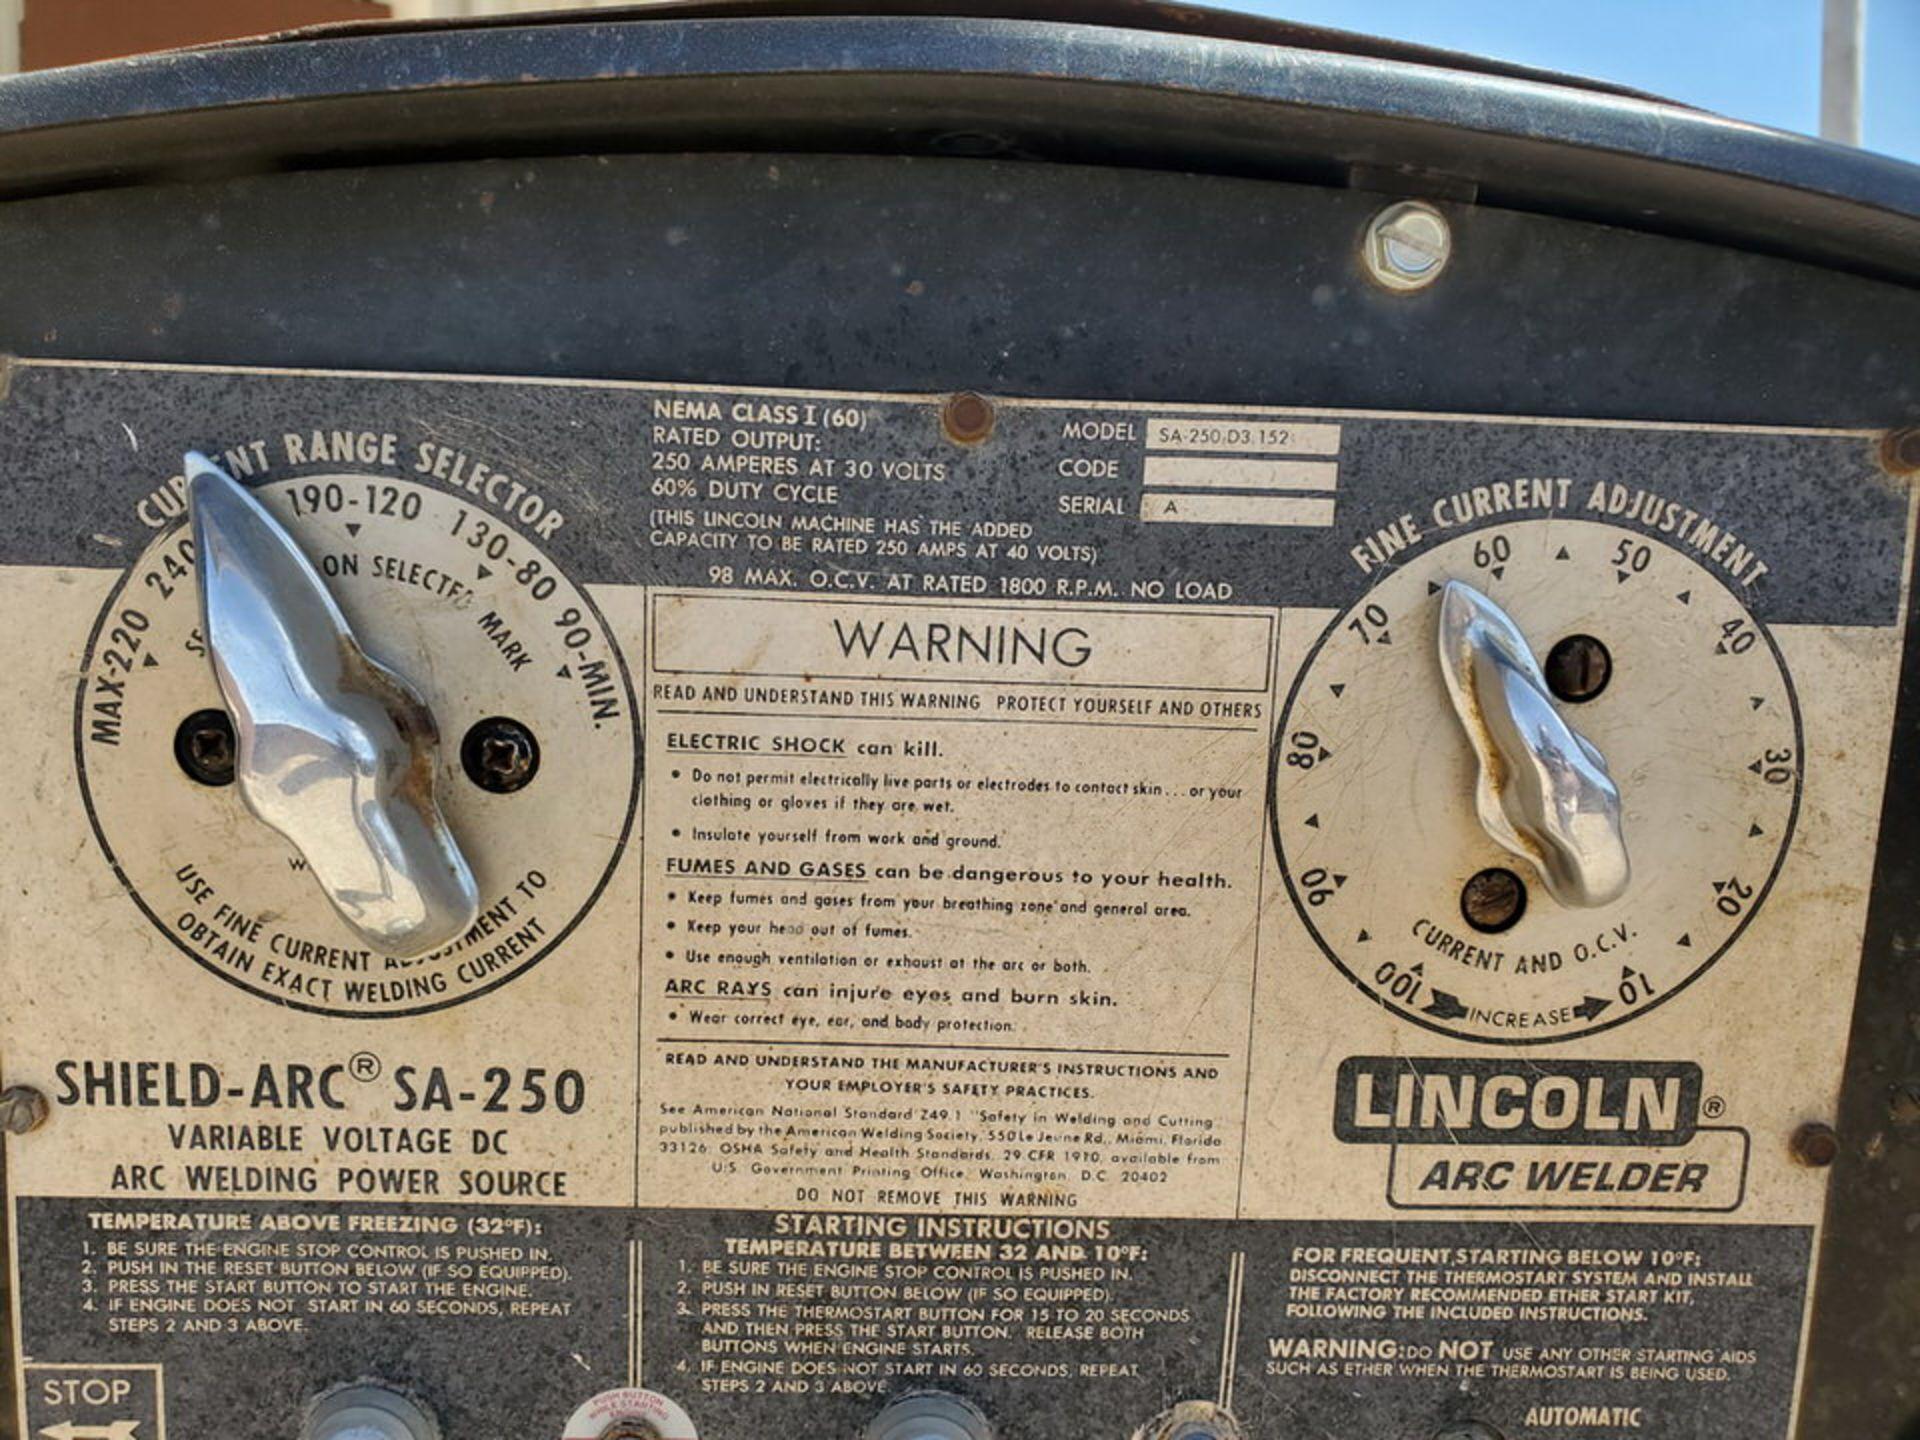 Lincoln Sa-250D3.152 Arc Welder - Image 9 of 11